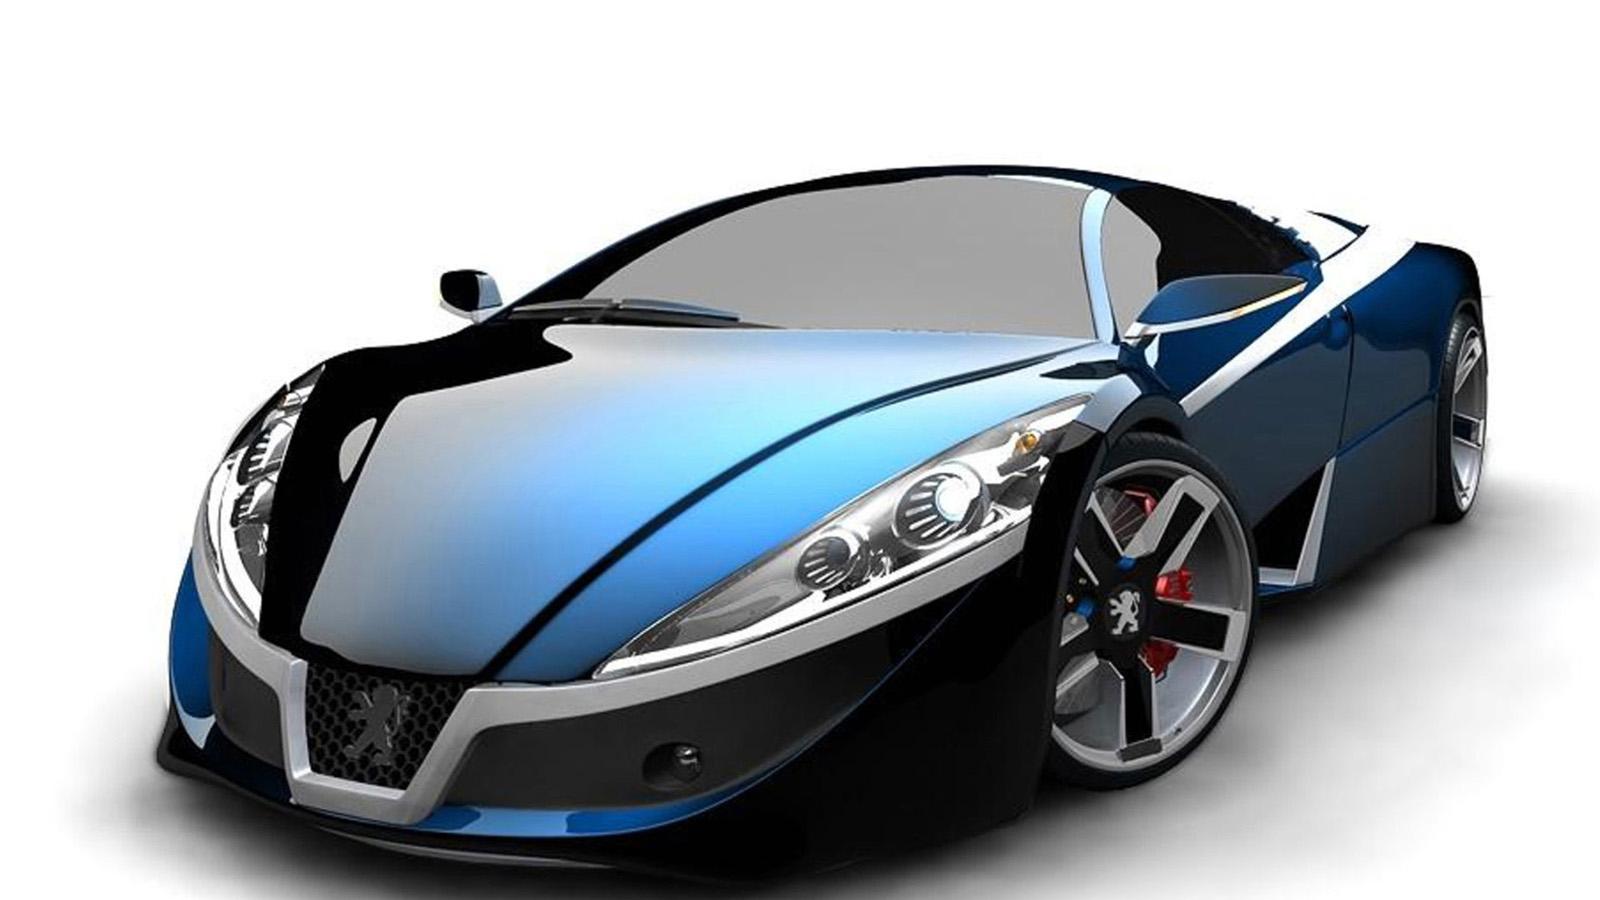 Car Exotic Wallpaper HD Wallpaper Downloads 1600x900